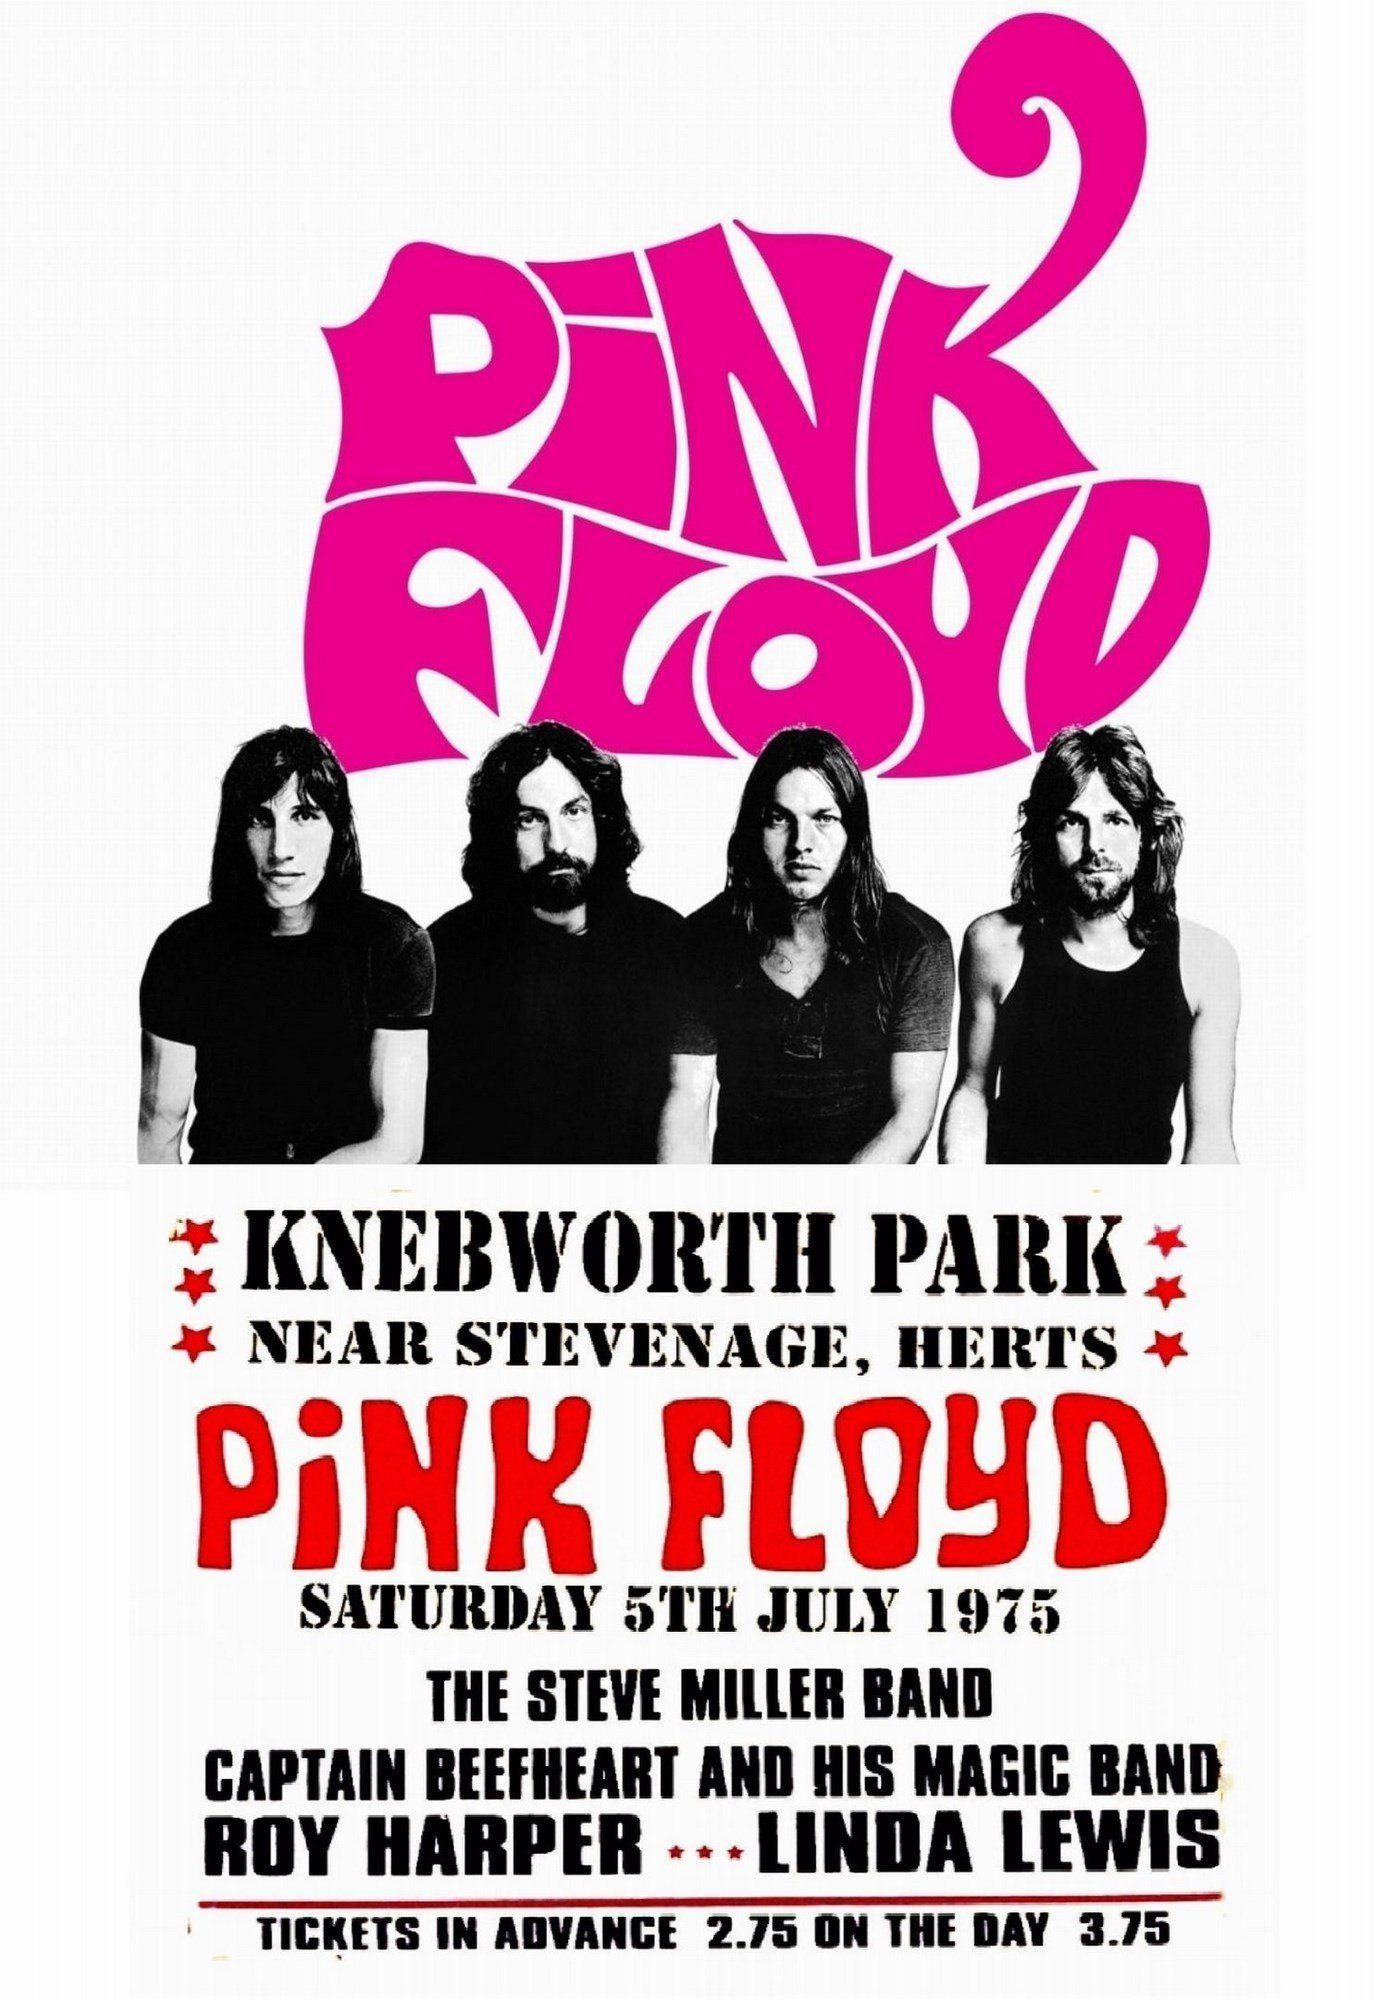 Pink Floyd Vintage Poster Knebworth Park Uk 1975 Pink Floyd Concert Poster Pink Floyd Concert Concert Posters